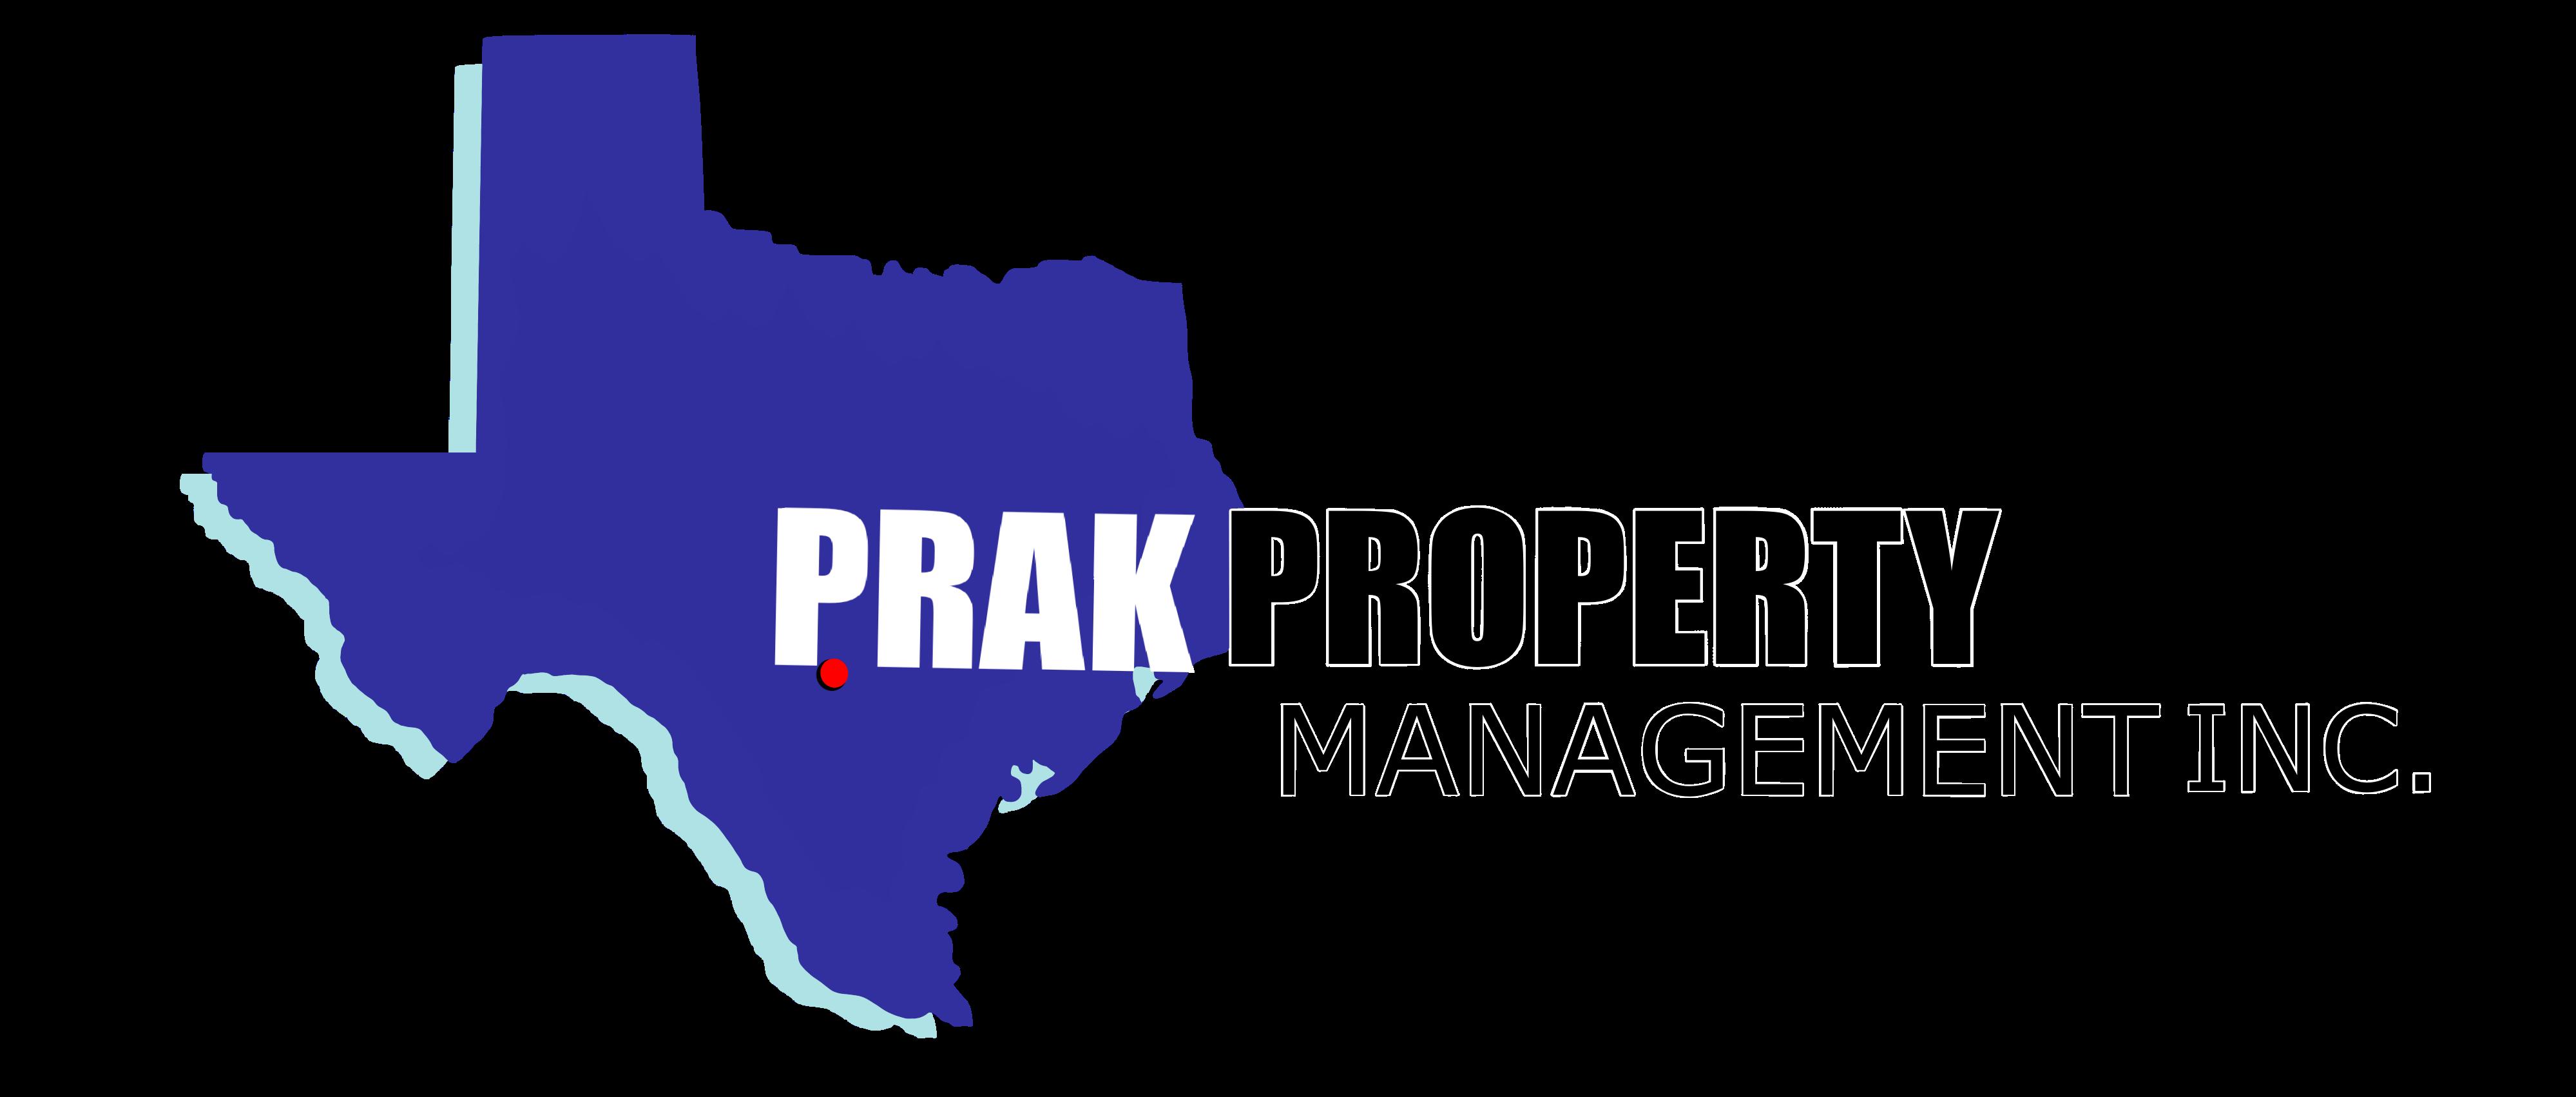 prak property management logo